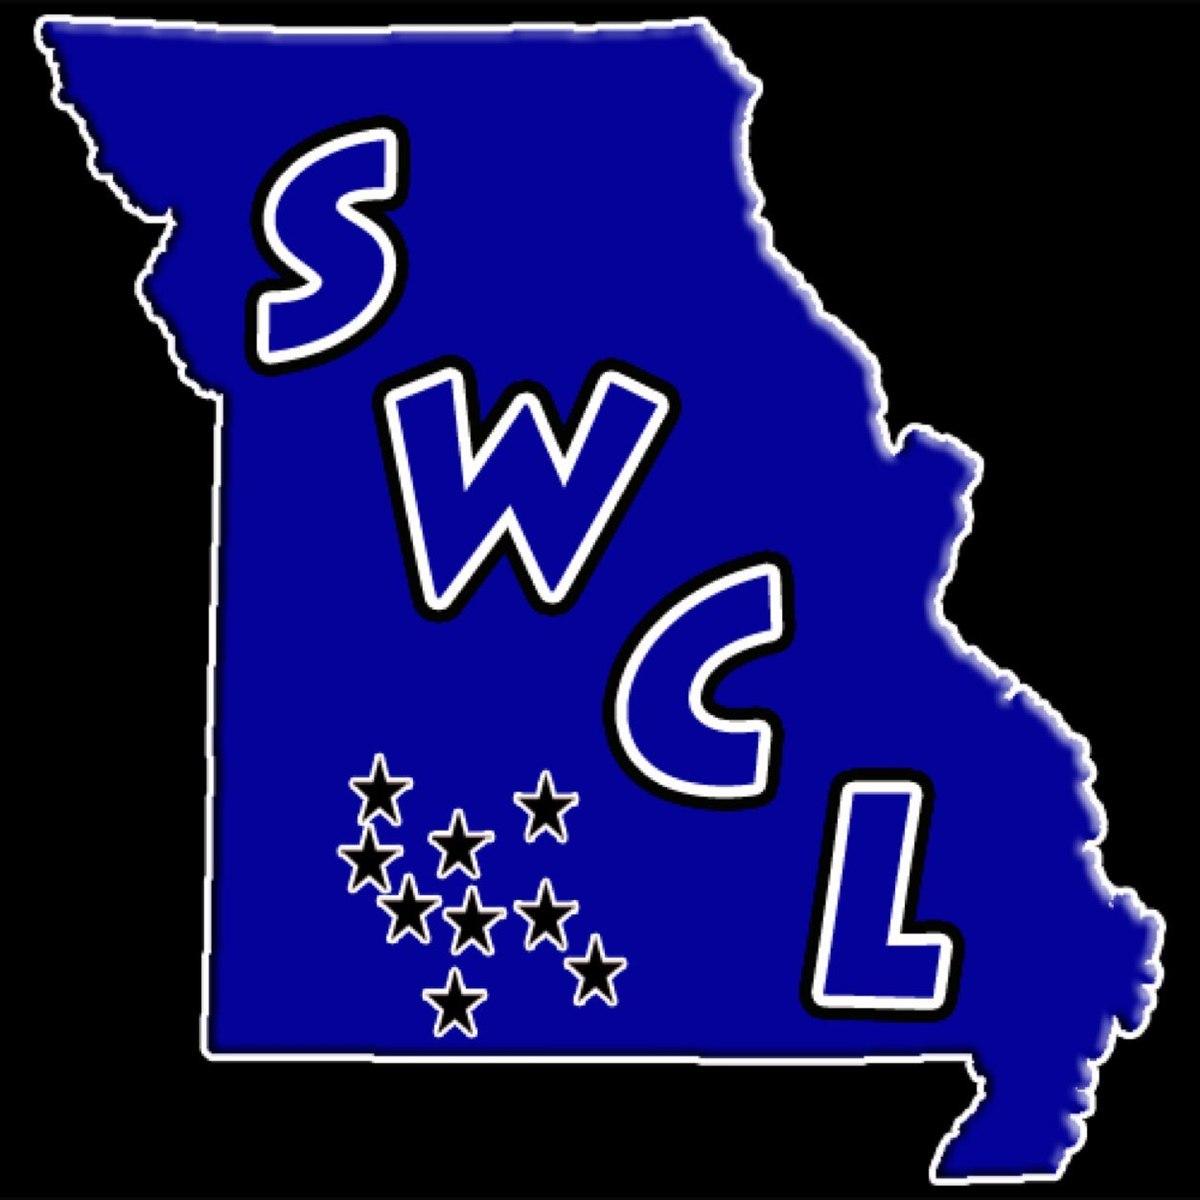 southwest central league wikipedia